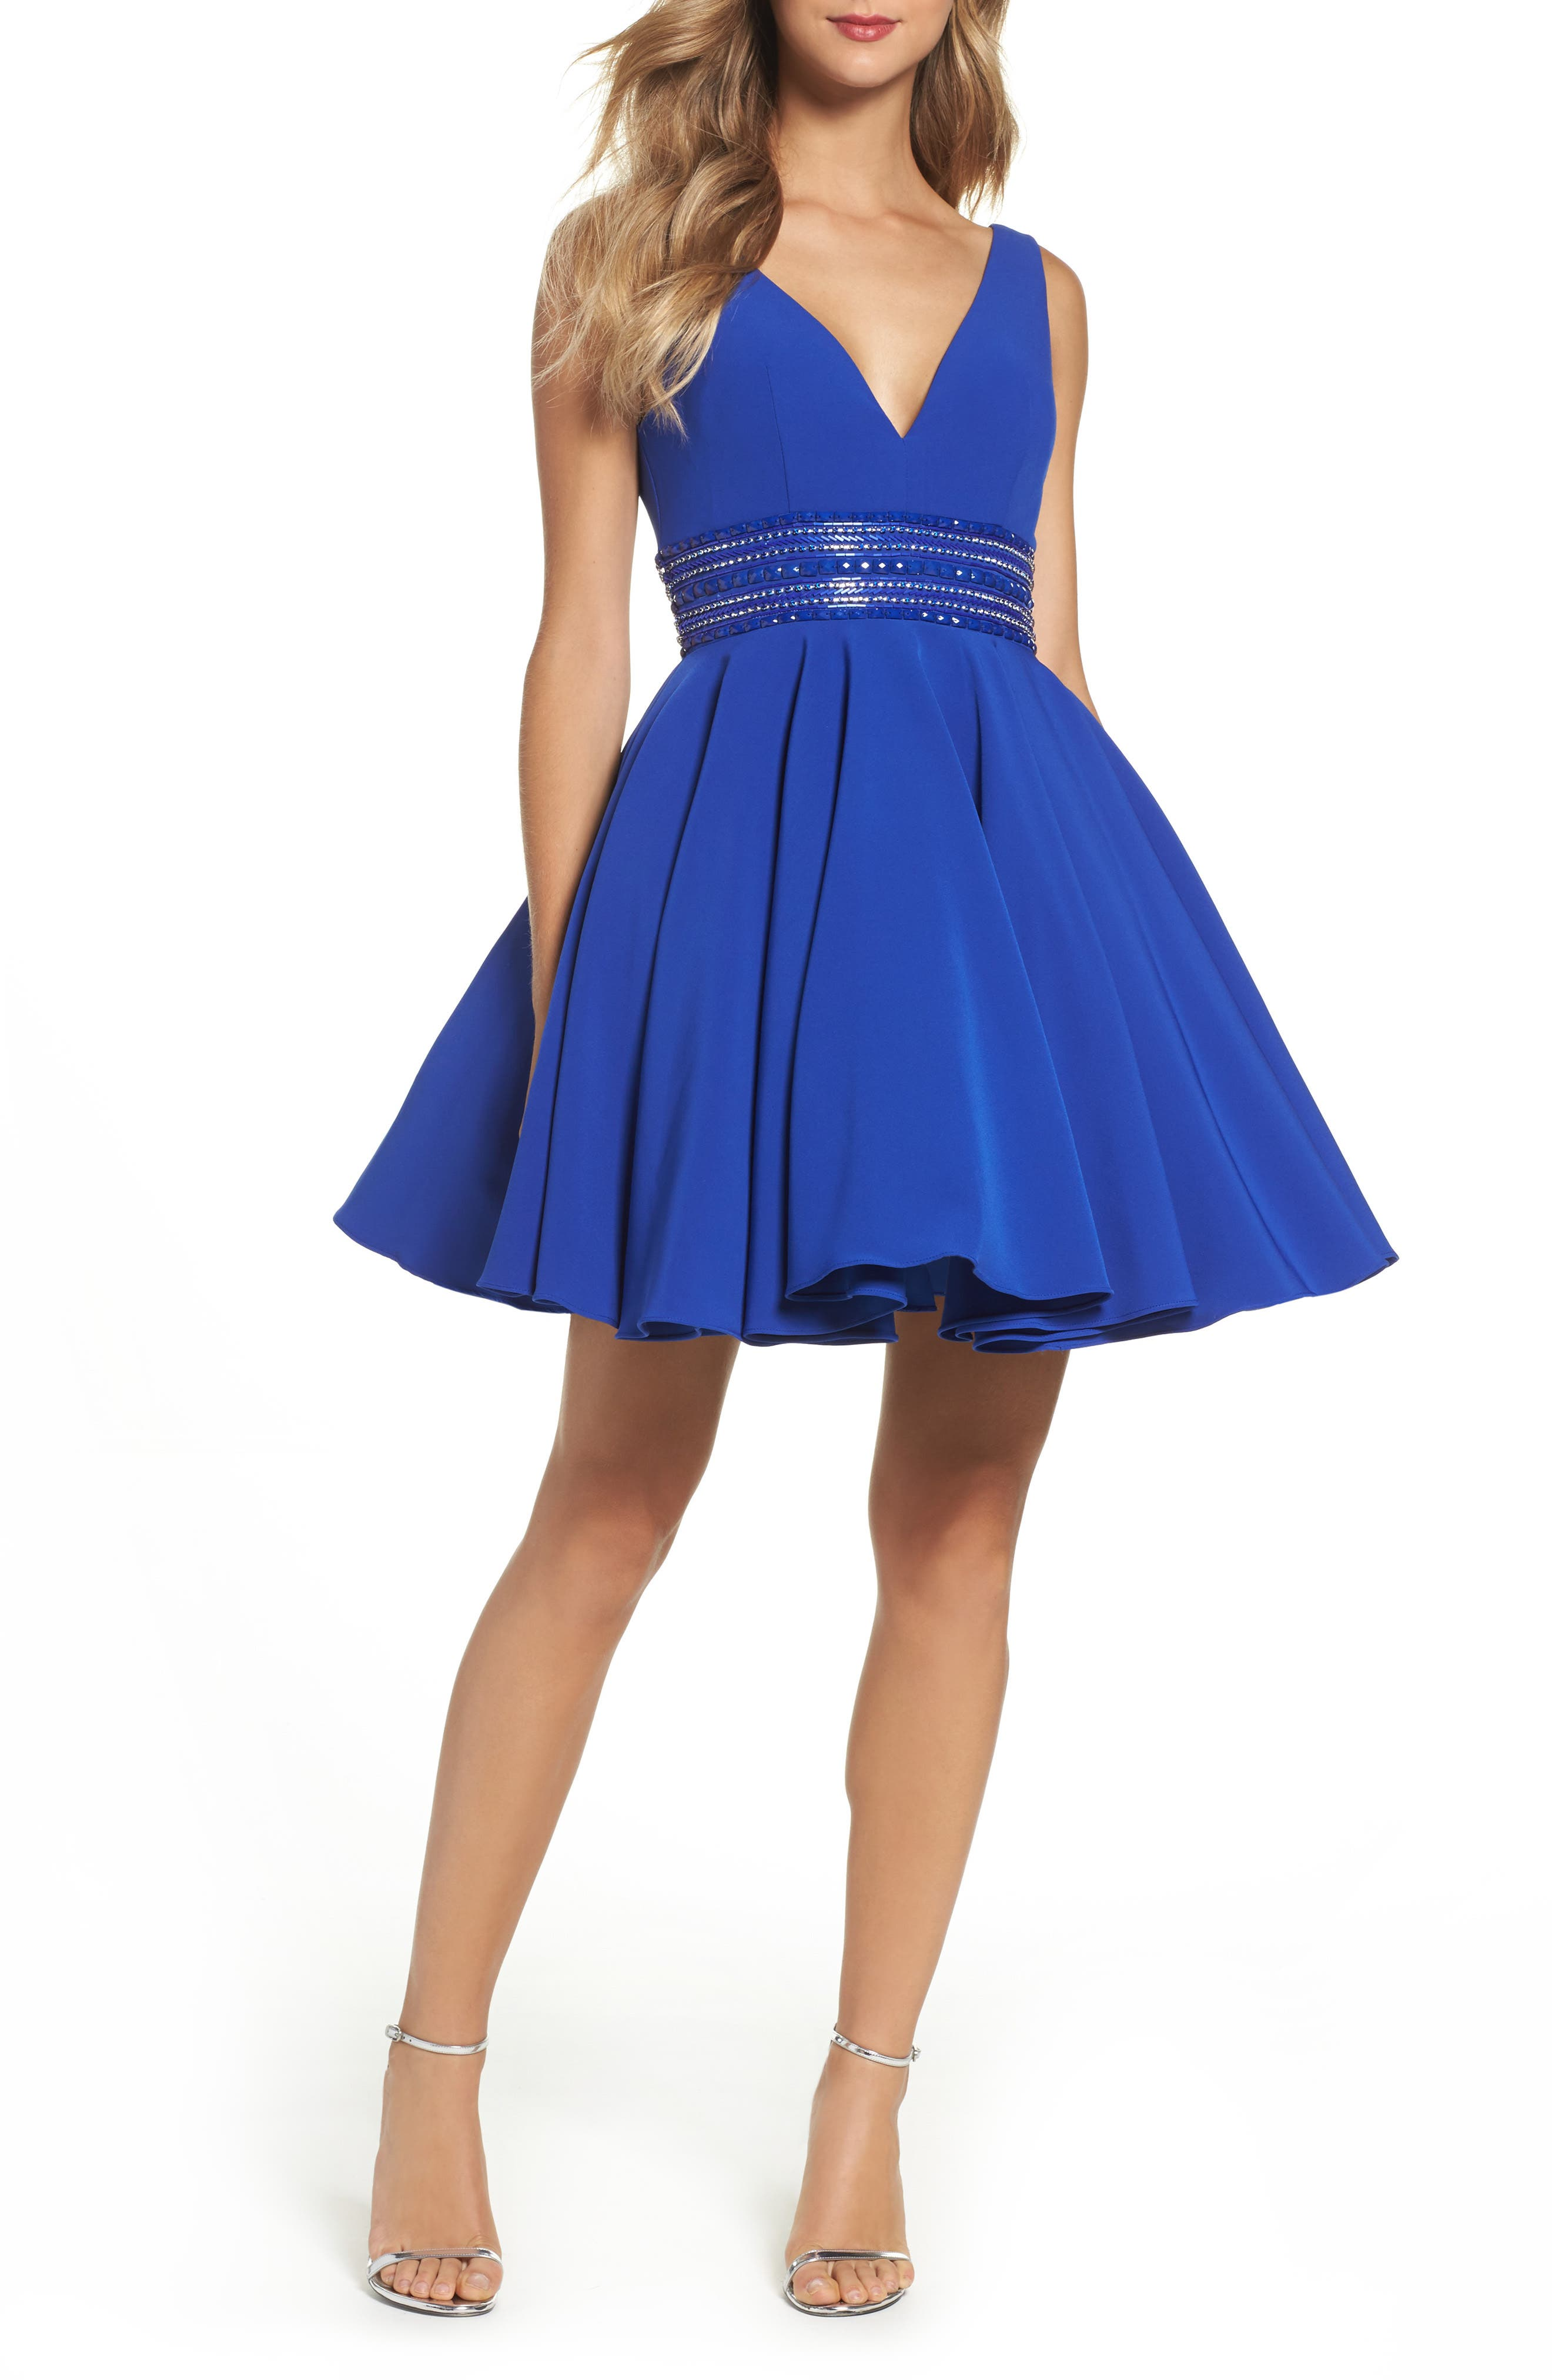 Ieena for Mac Duggal Embellished Fit & Flare Dress